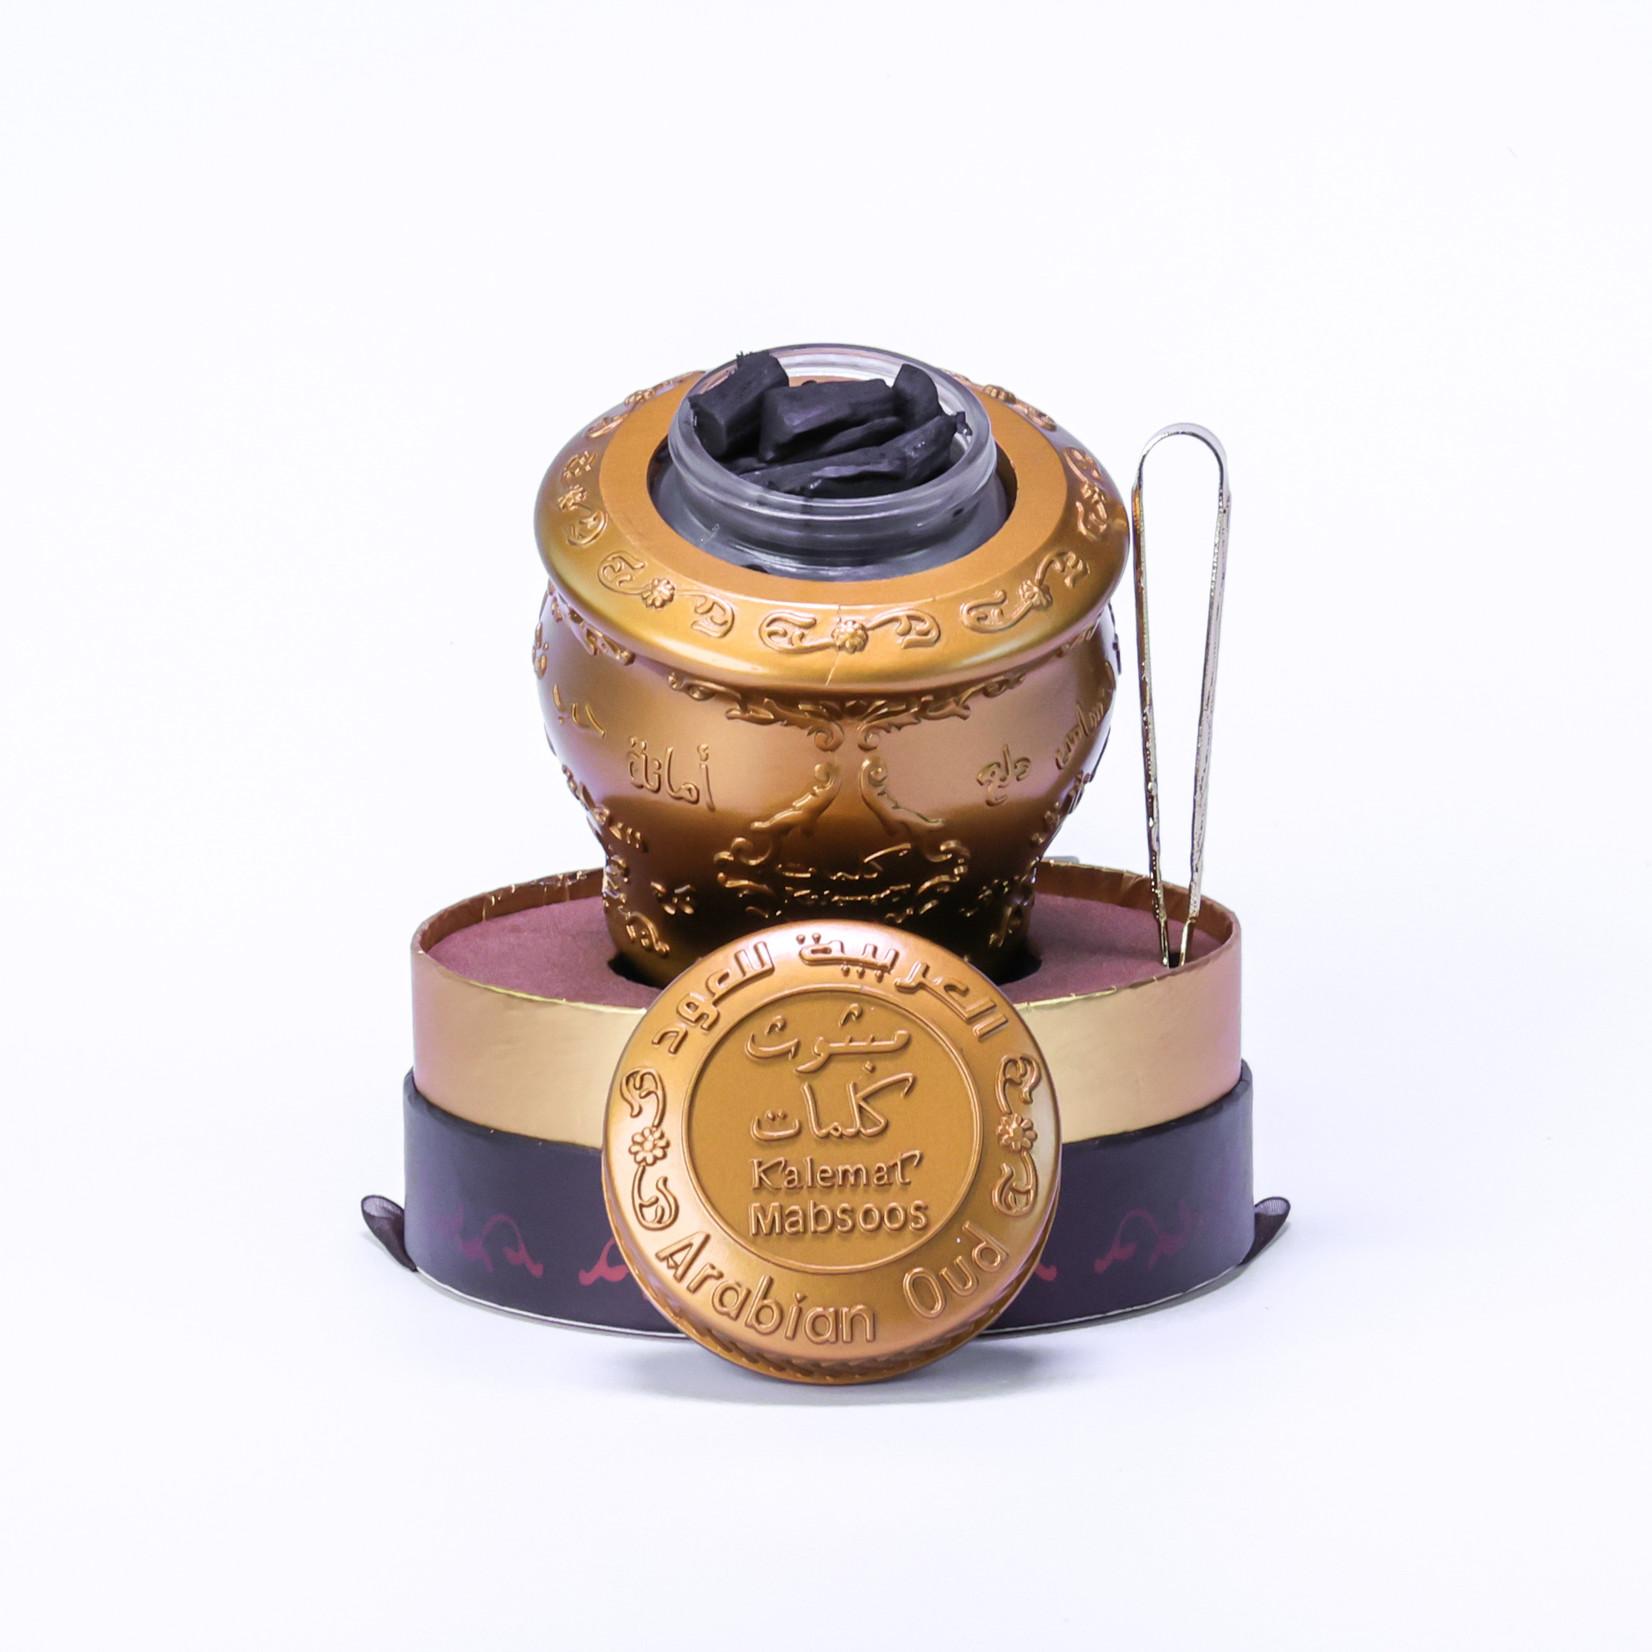 Arabian Oud Mabsoos Kalemat (40 Gram)